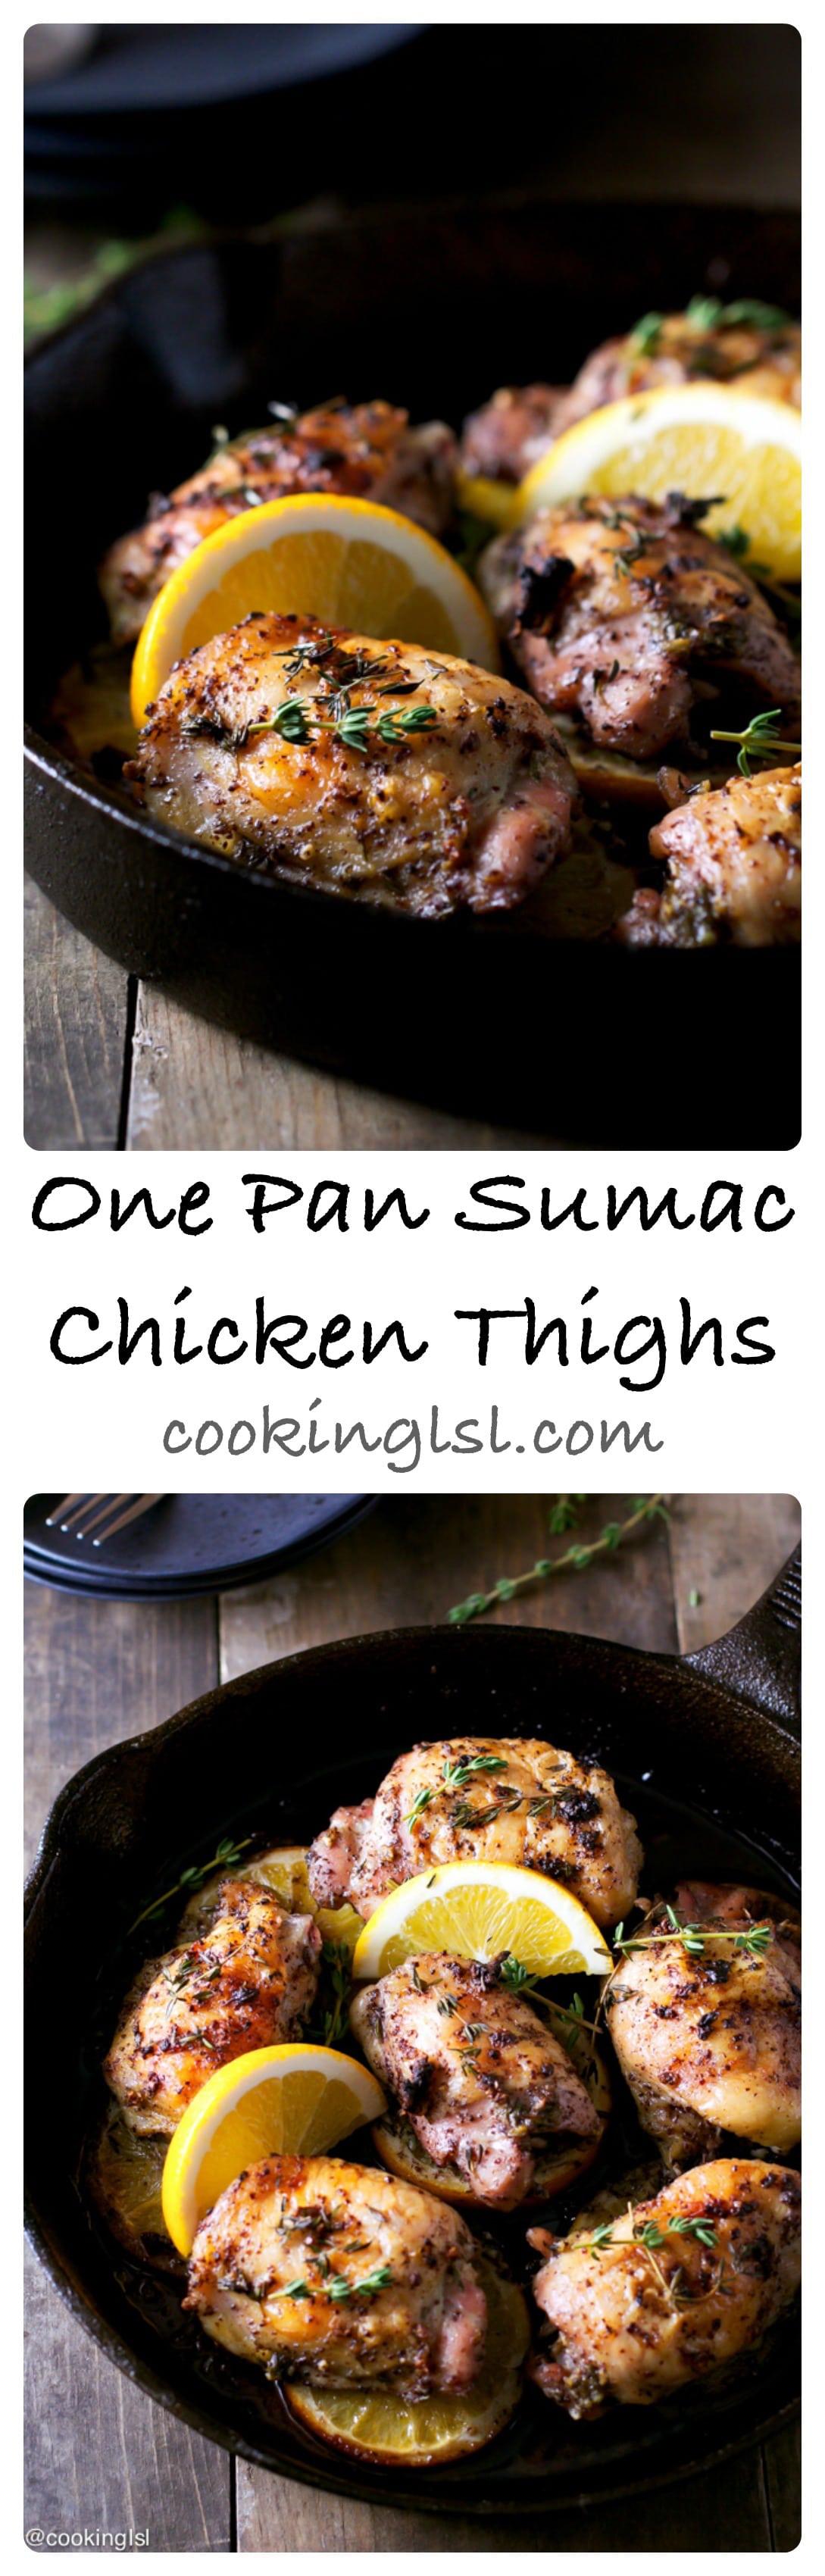 One Pan Sumac Chicken Thighs